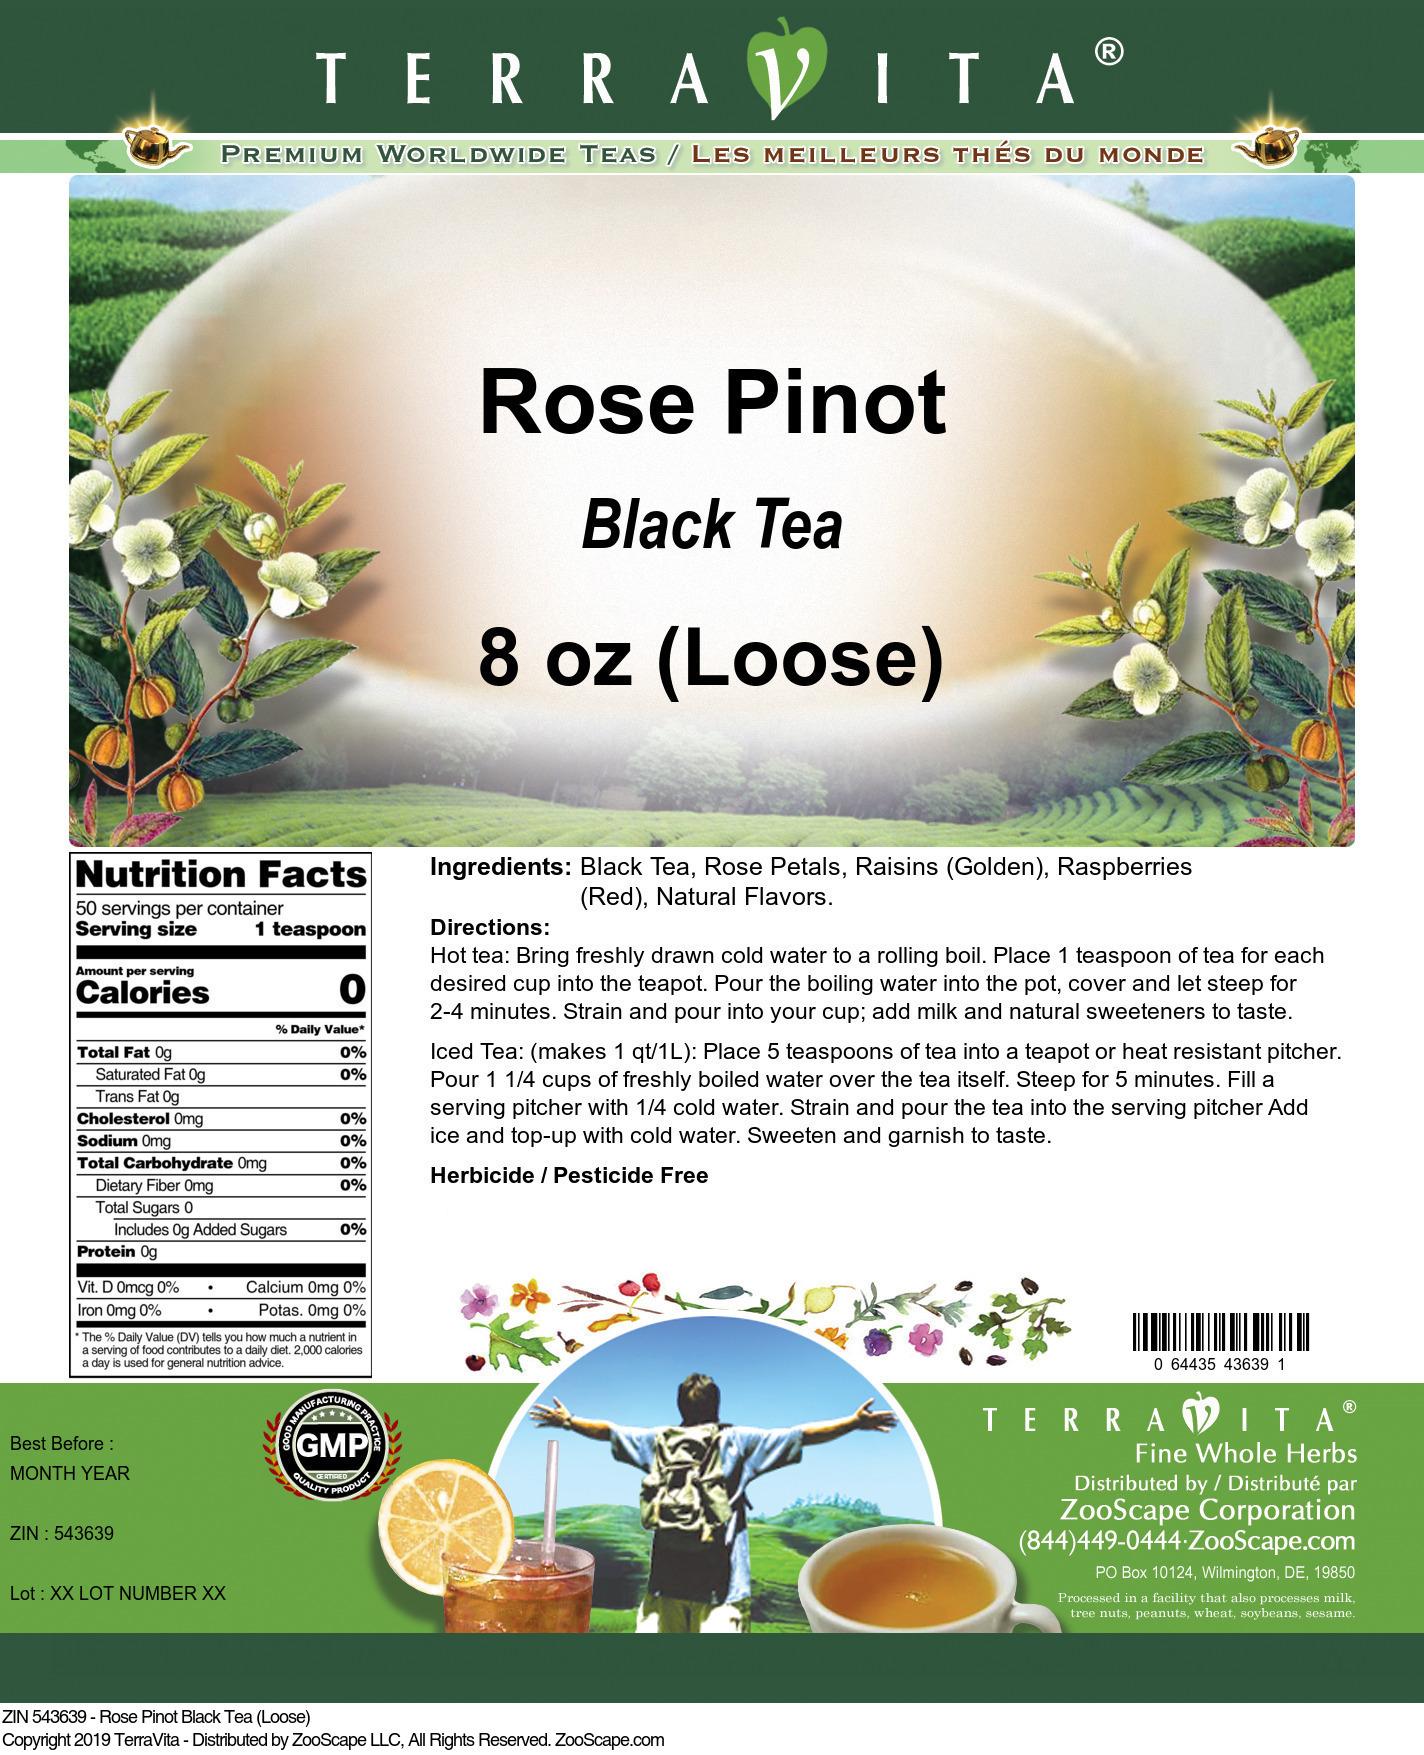 Rose Pinot Black Tea (Loose)